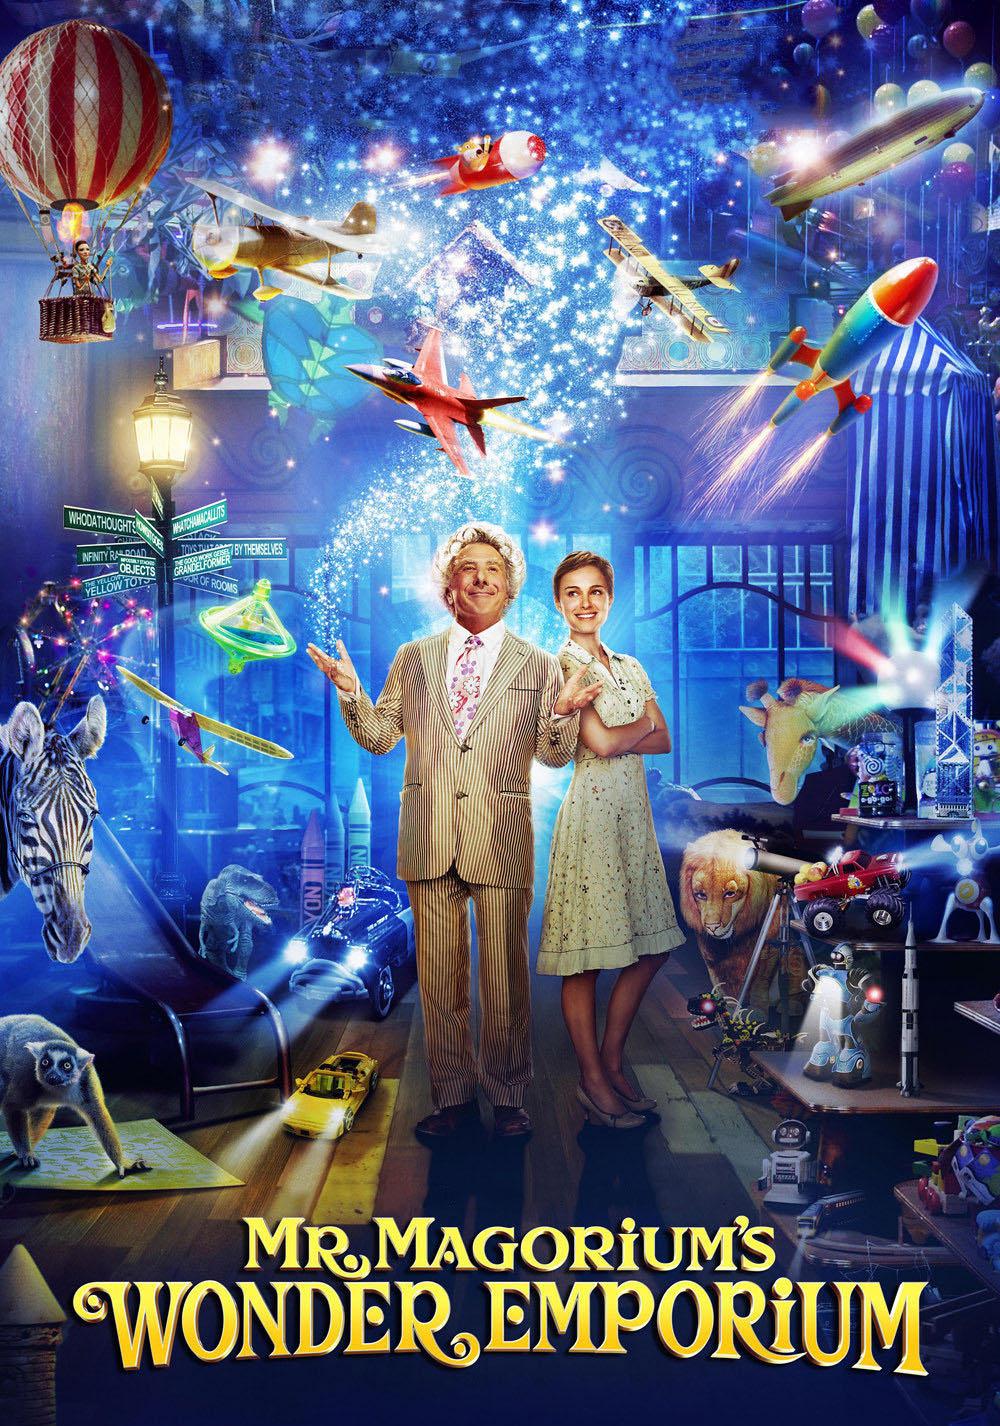 Movie Poster nanny mcphee movie poster : Mr. Magoriumu0026#39;s Wonder Emporium : Movie fanart : fanart.tv